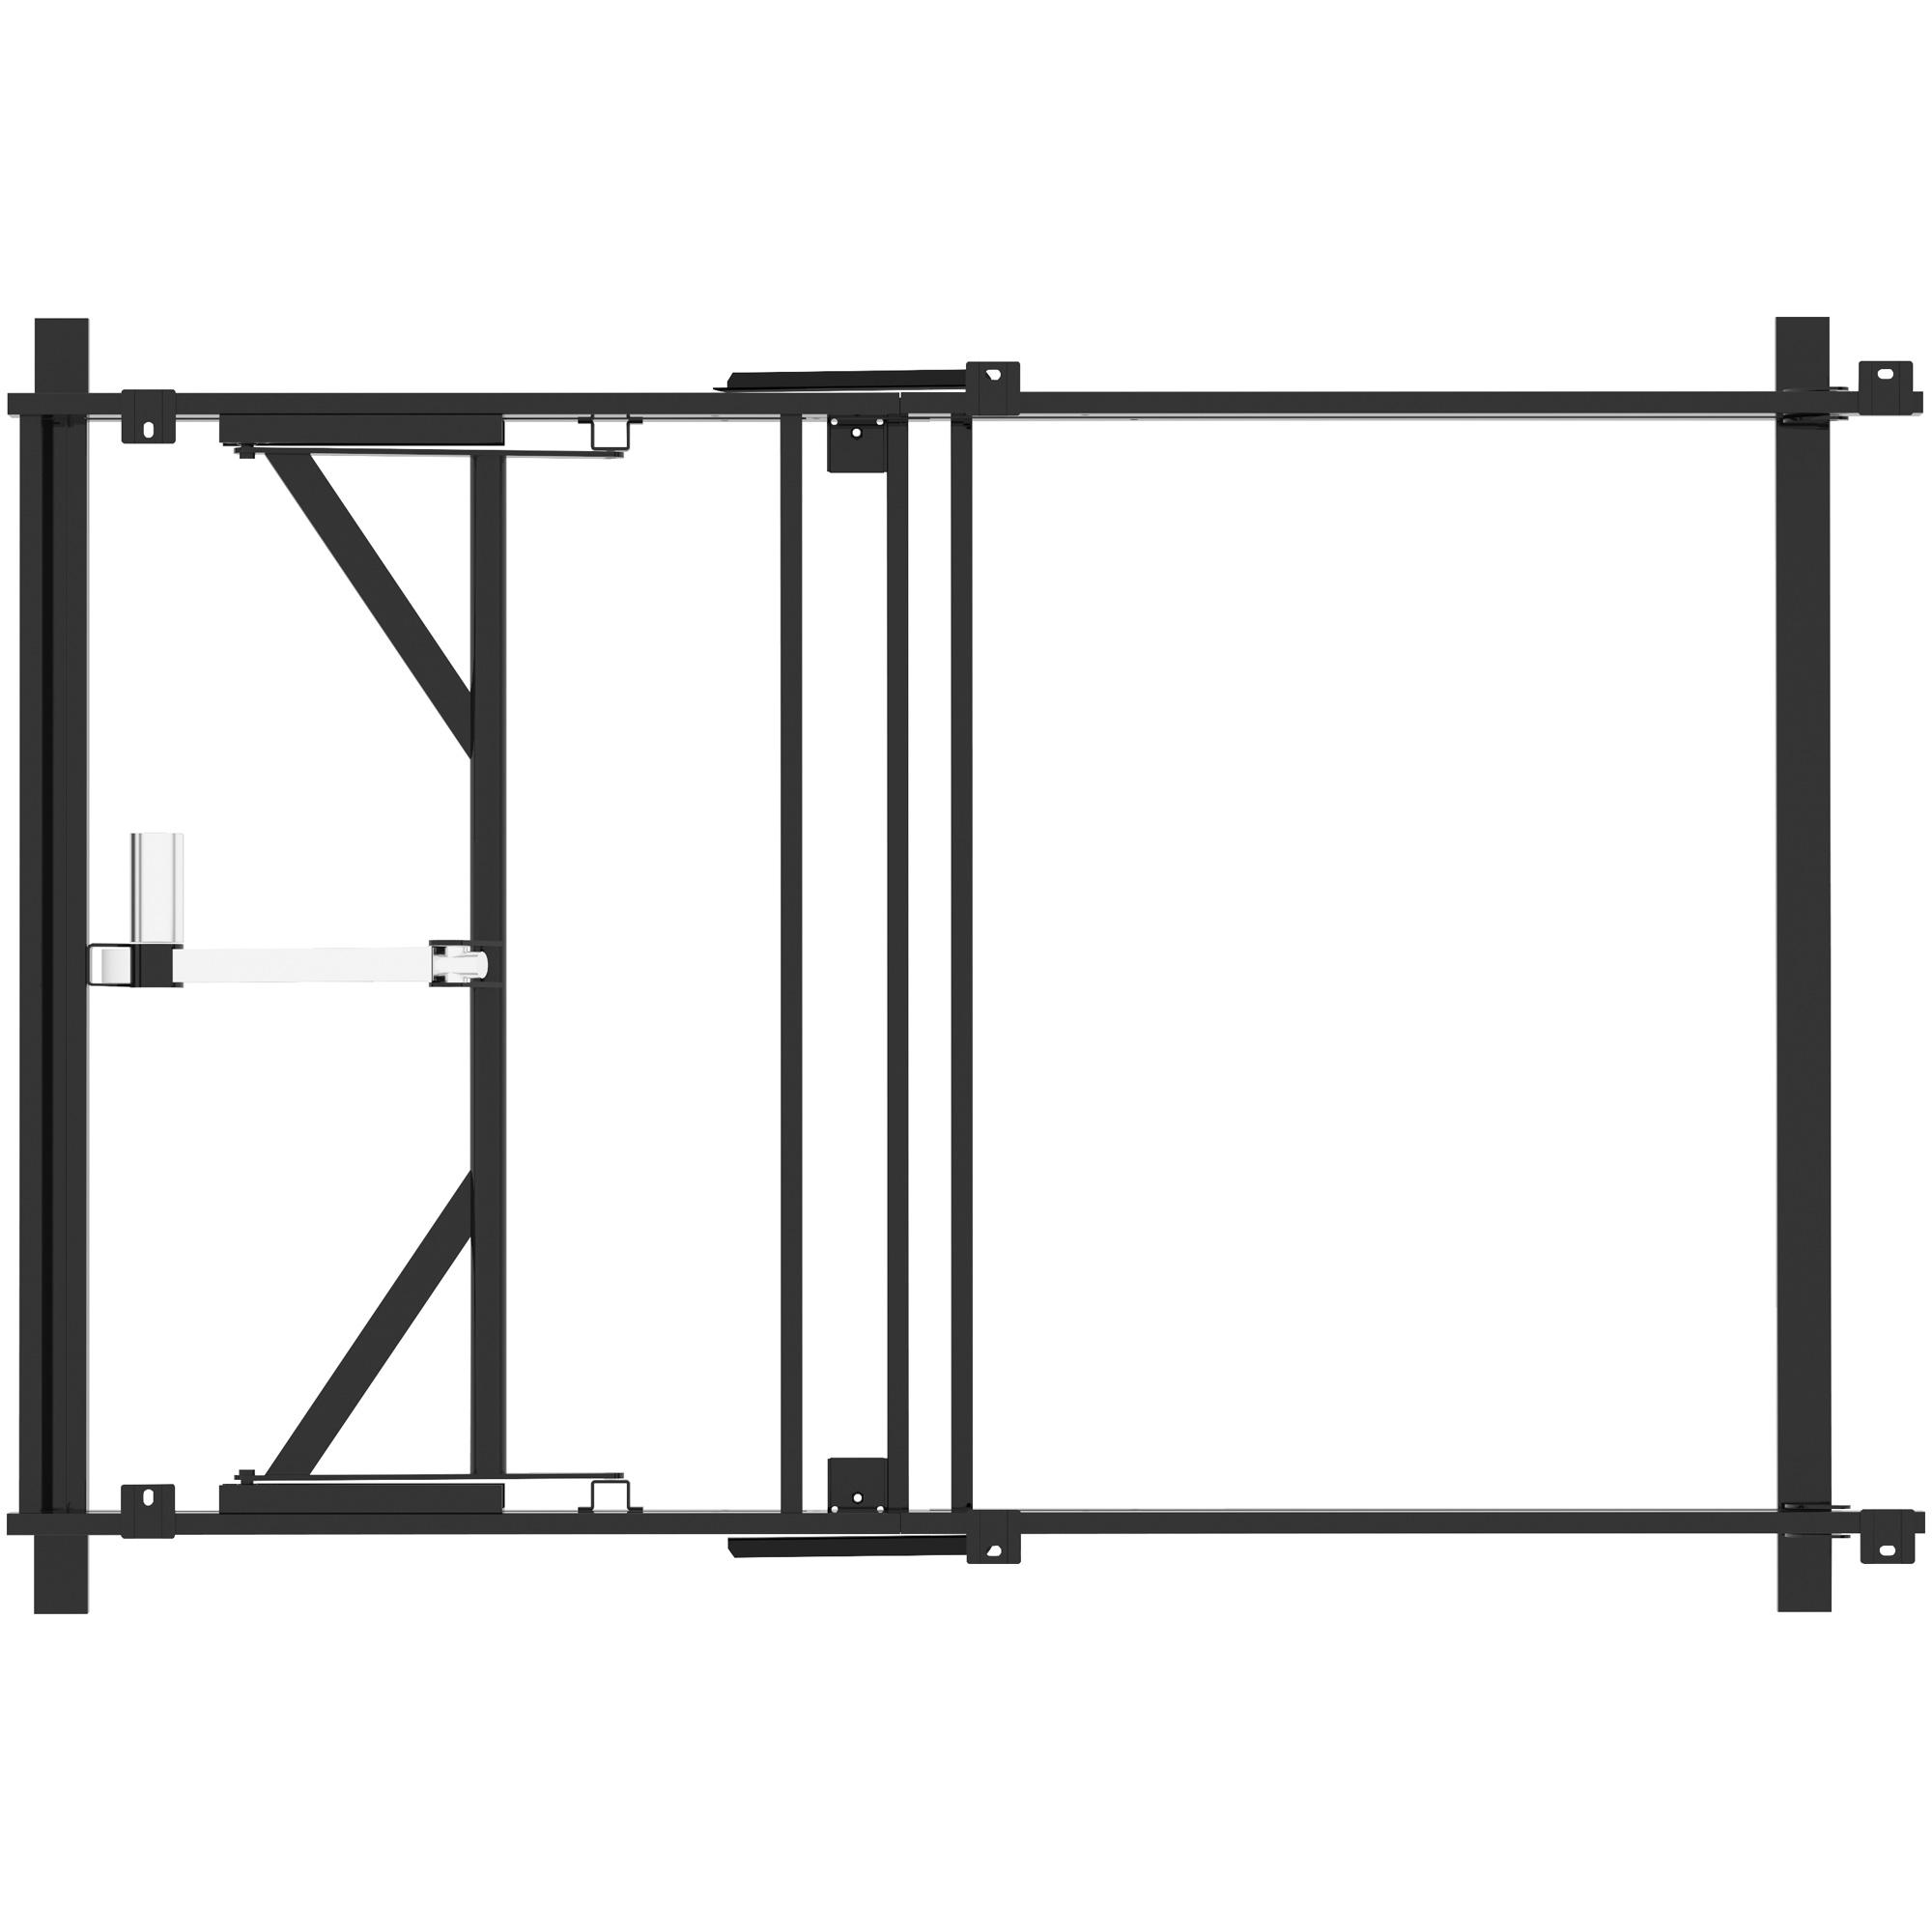 Glideaway | Glide Motion Queen Elevation Kit Adjustable Bed Base